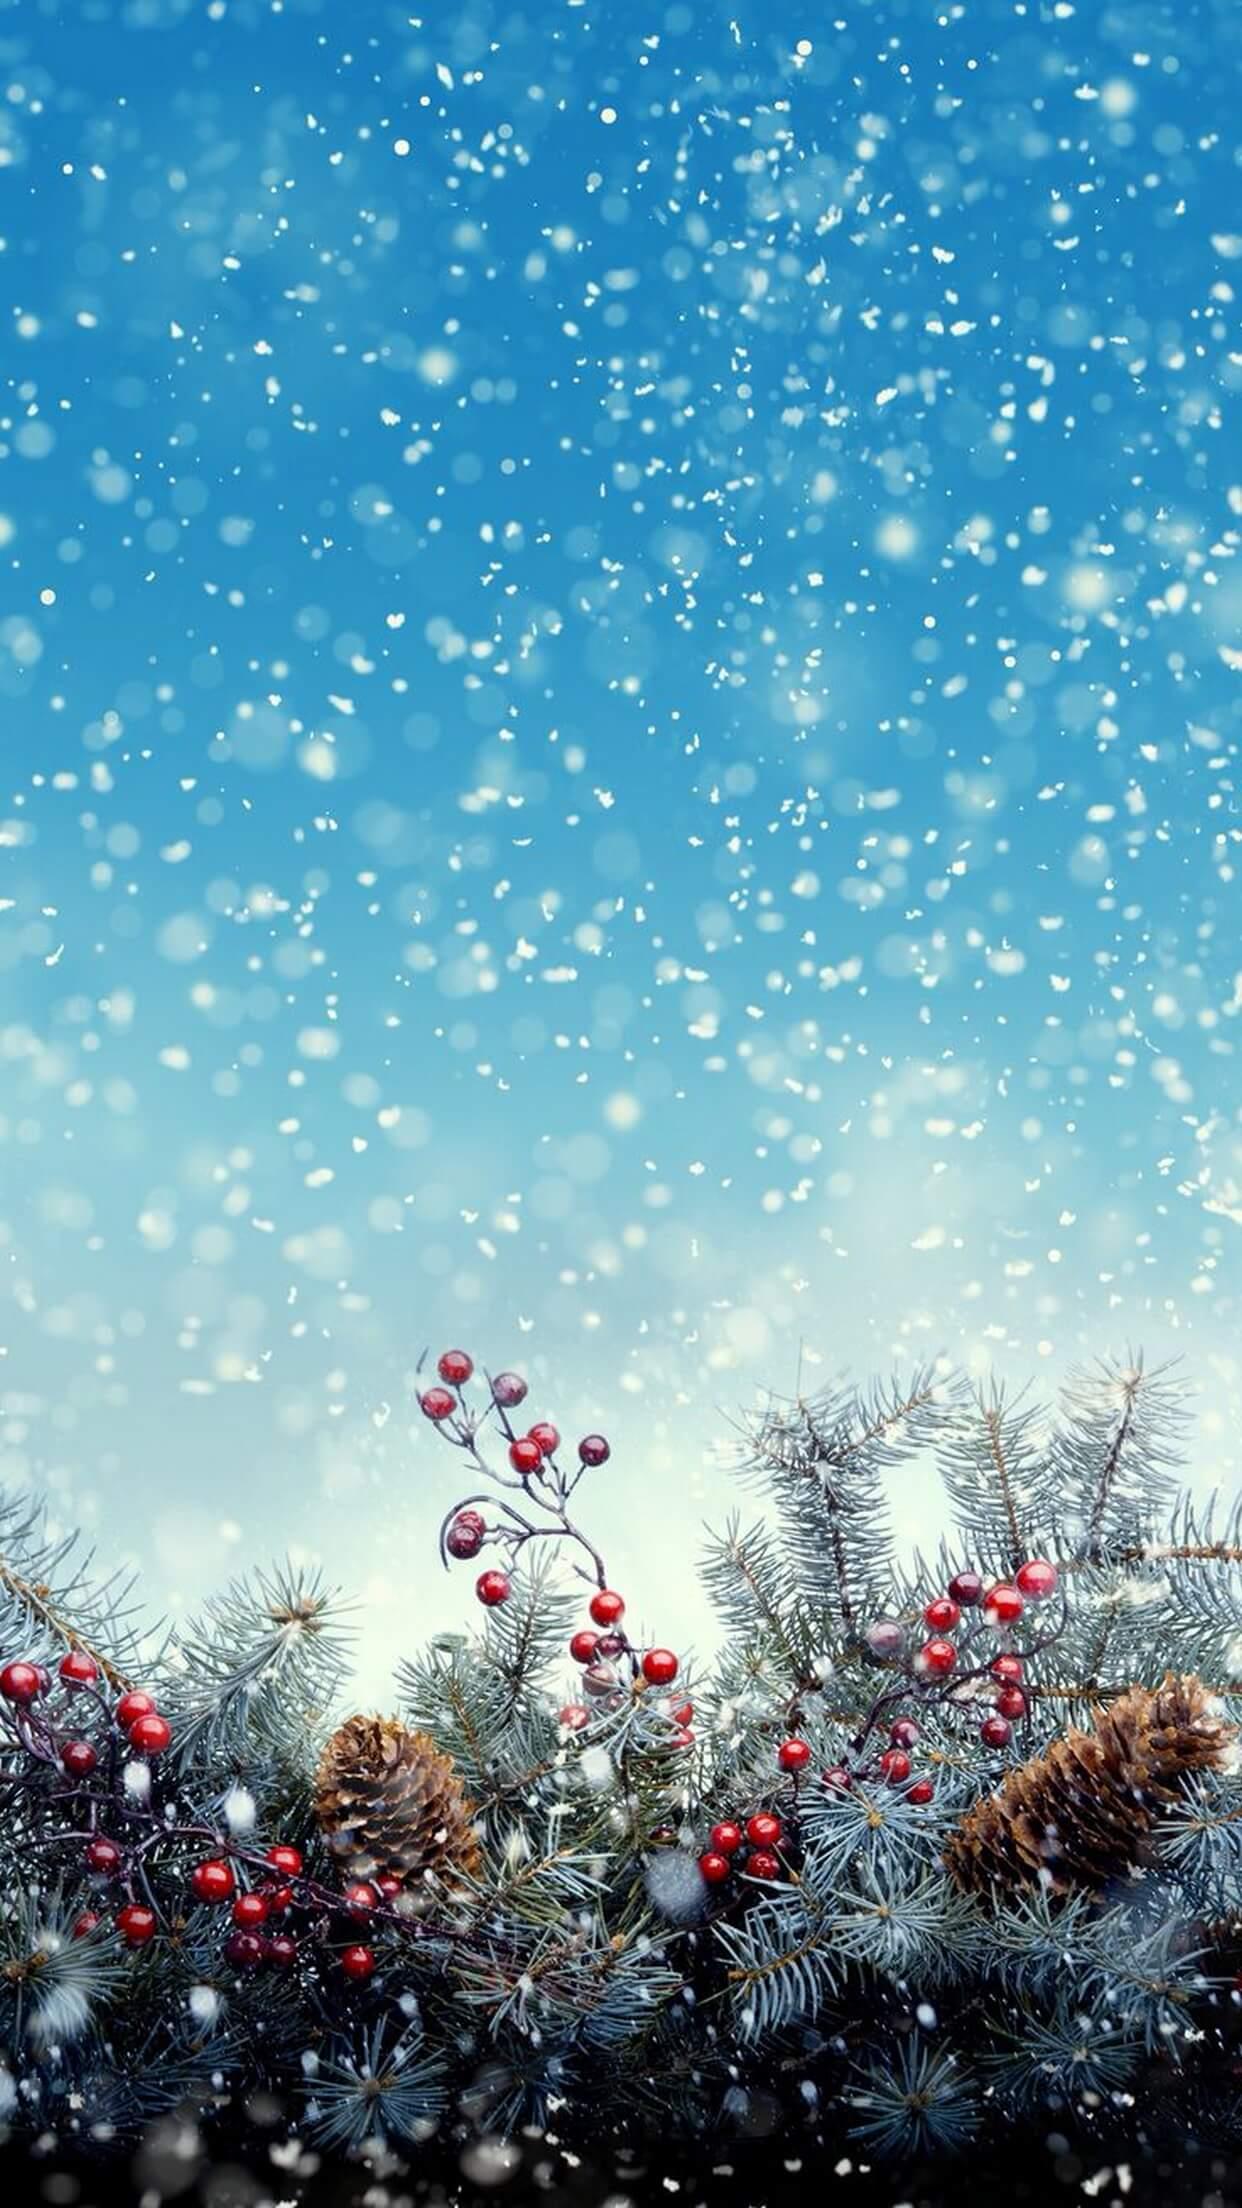 Christmas Picture Animated Christmas Decoration Image Sky